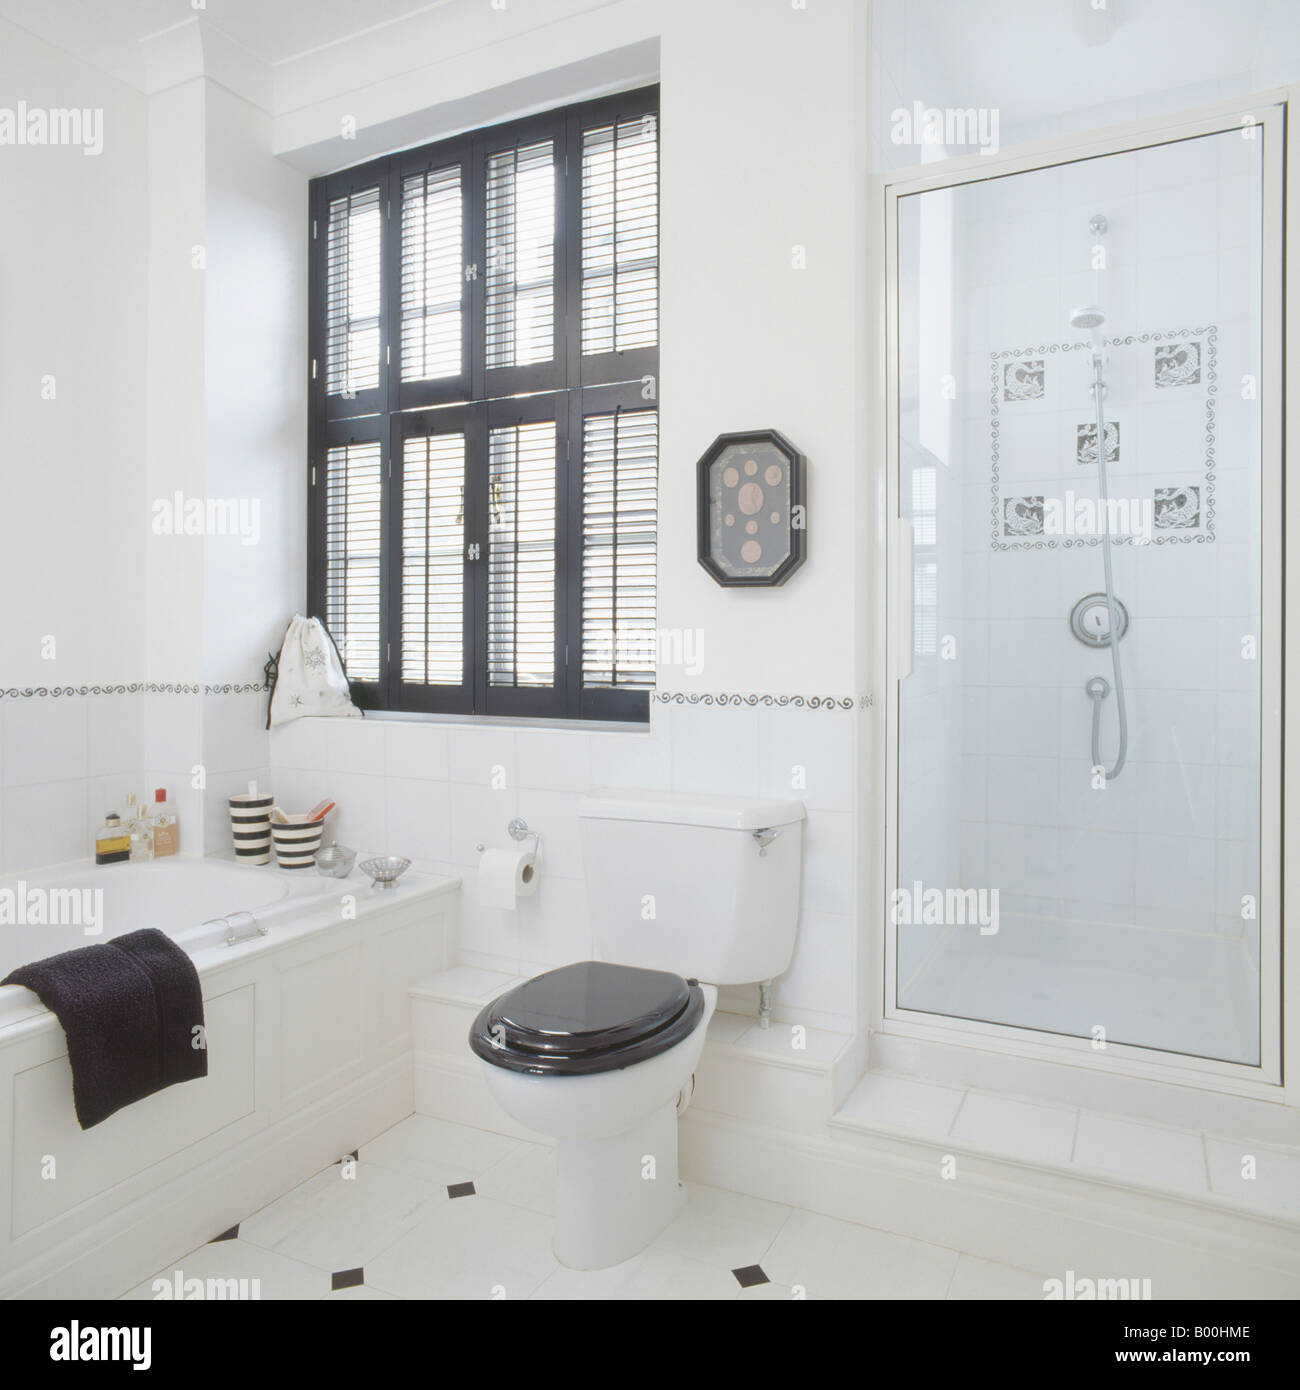 Black Plantation Shutters Above Bath And Black Toilet Seat